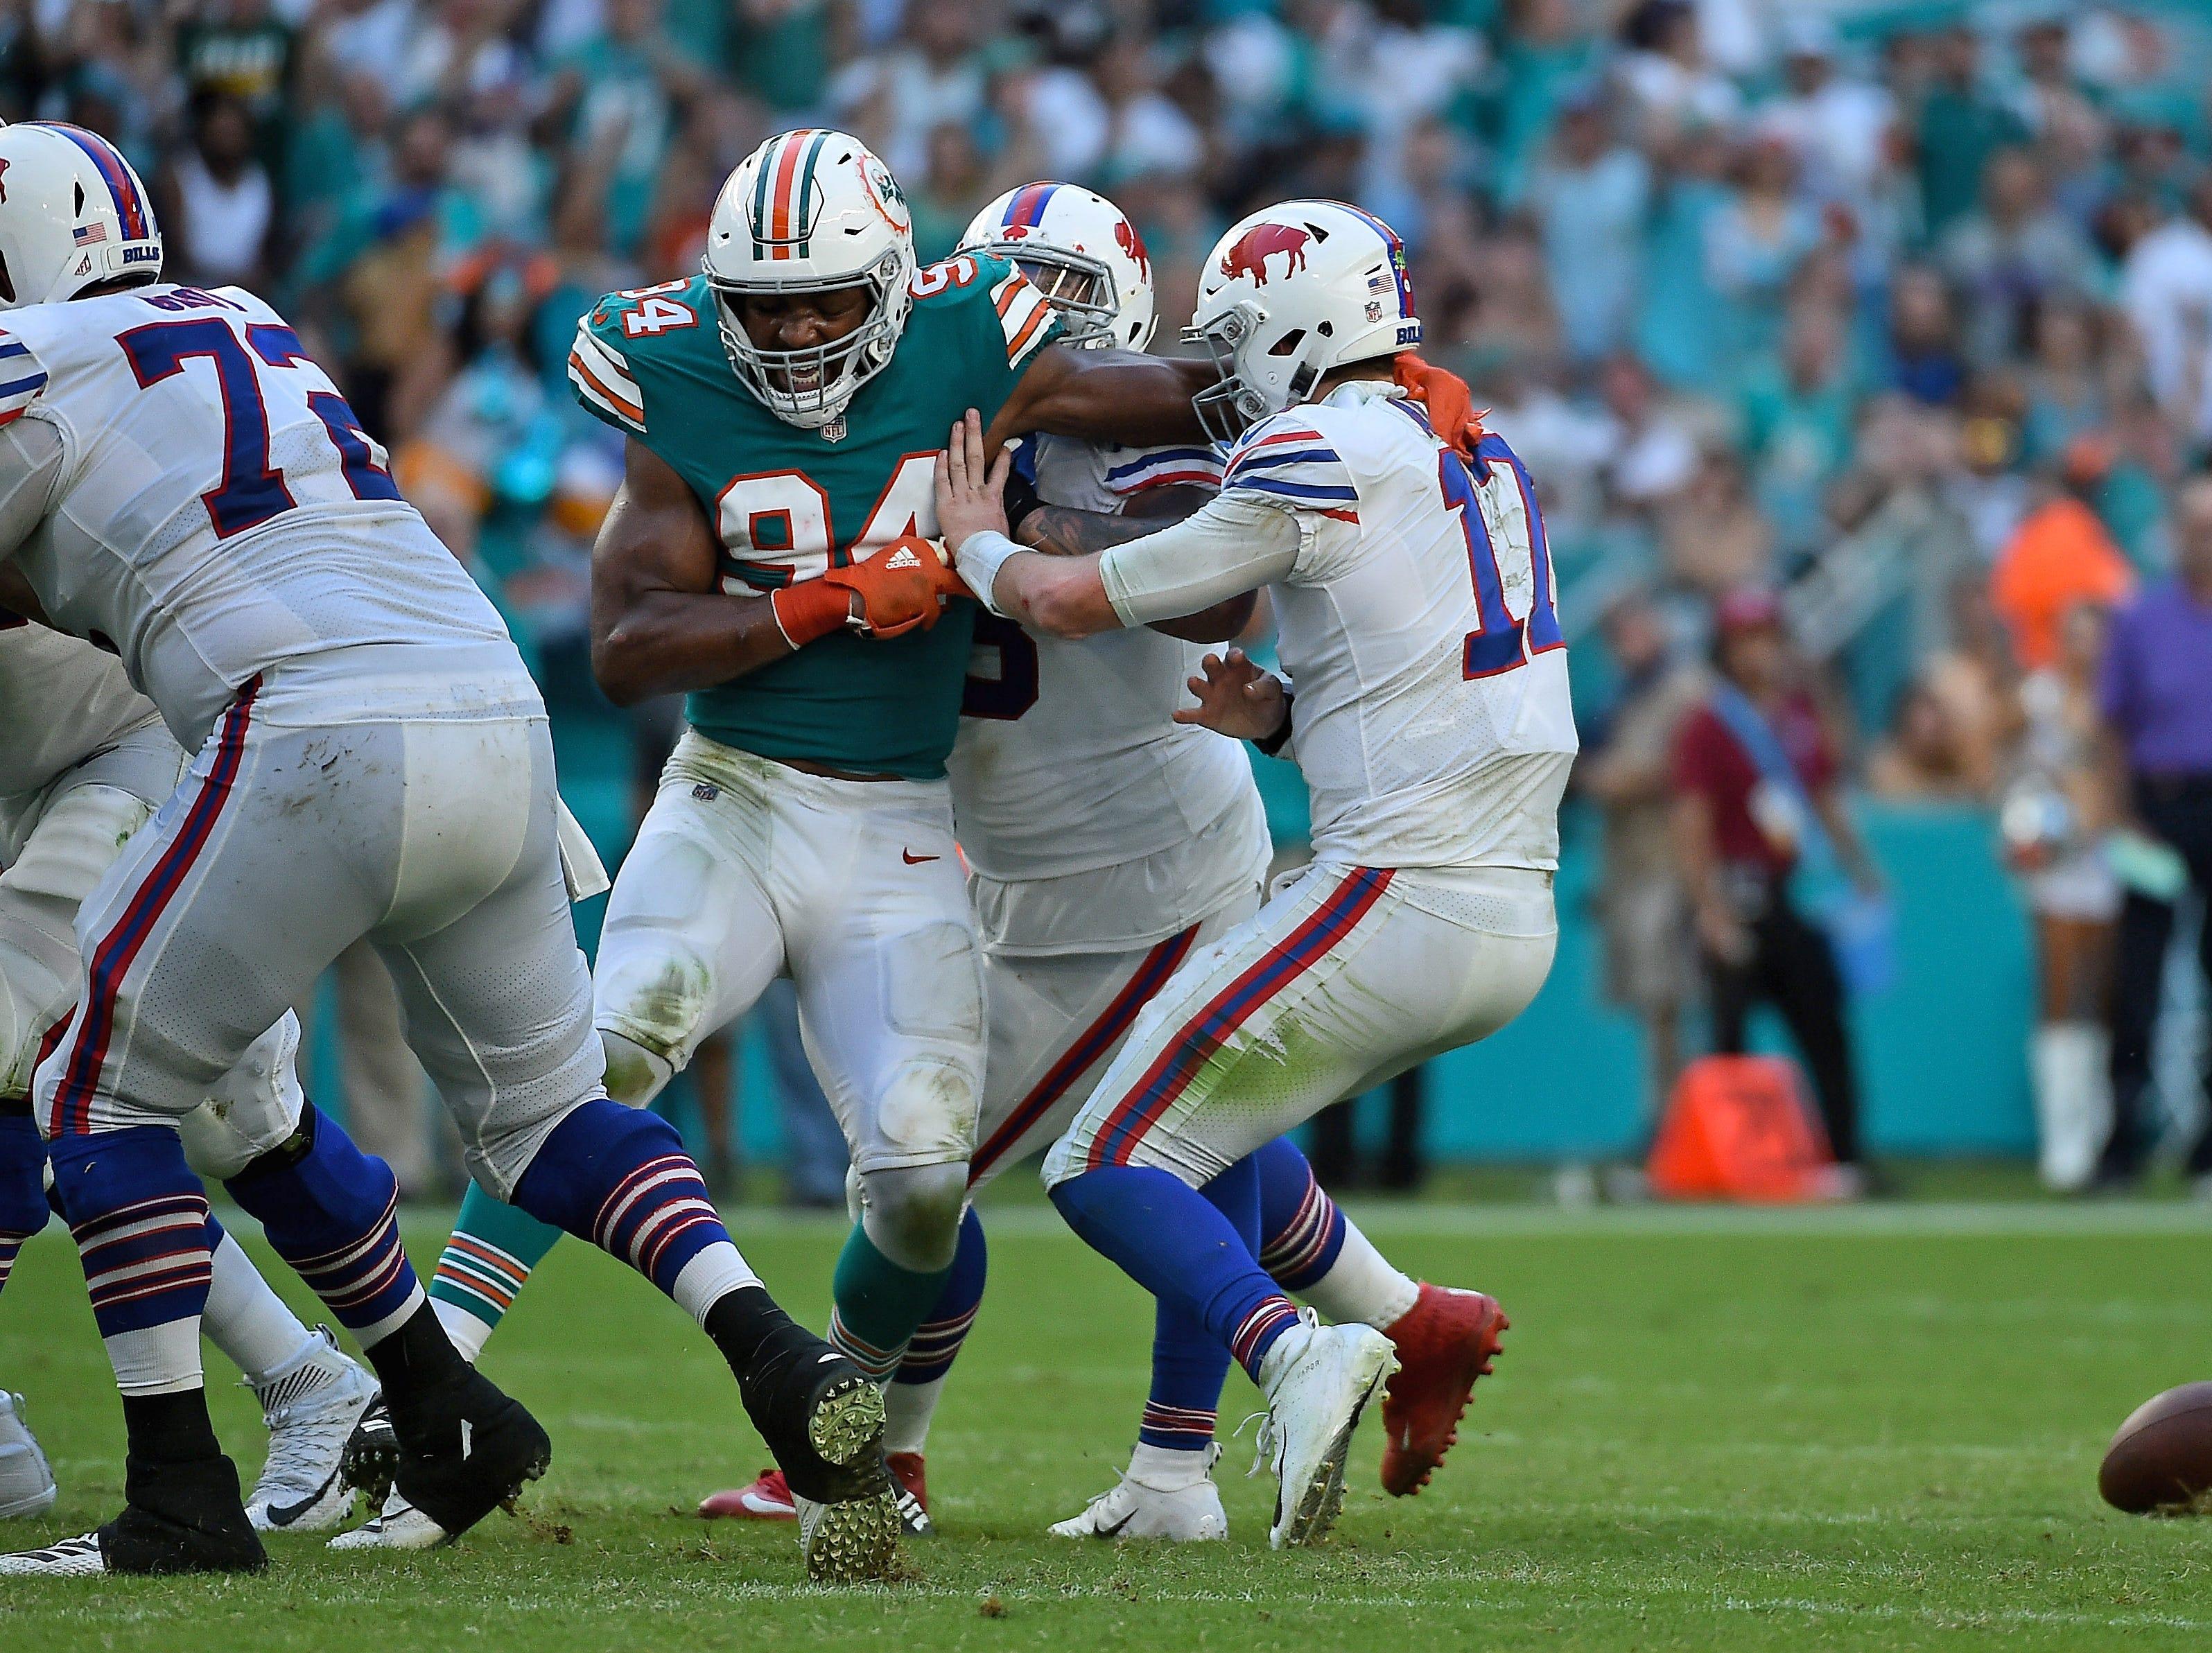 Dec 2, 2018; Miami Gardens, FL, USA; Miami Dolphins defensive end Robert Quinn (94) forces Buffalo Bills quarterback Josh Allen (17) to fumble the ball during the second half at Hard Rock Stadium. Mandatory Credit: Jasen Vinlove-USA TODAY Sports